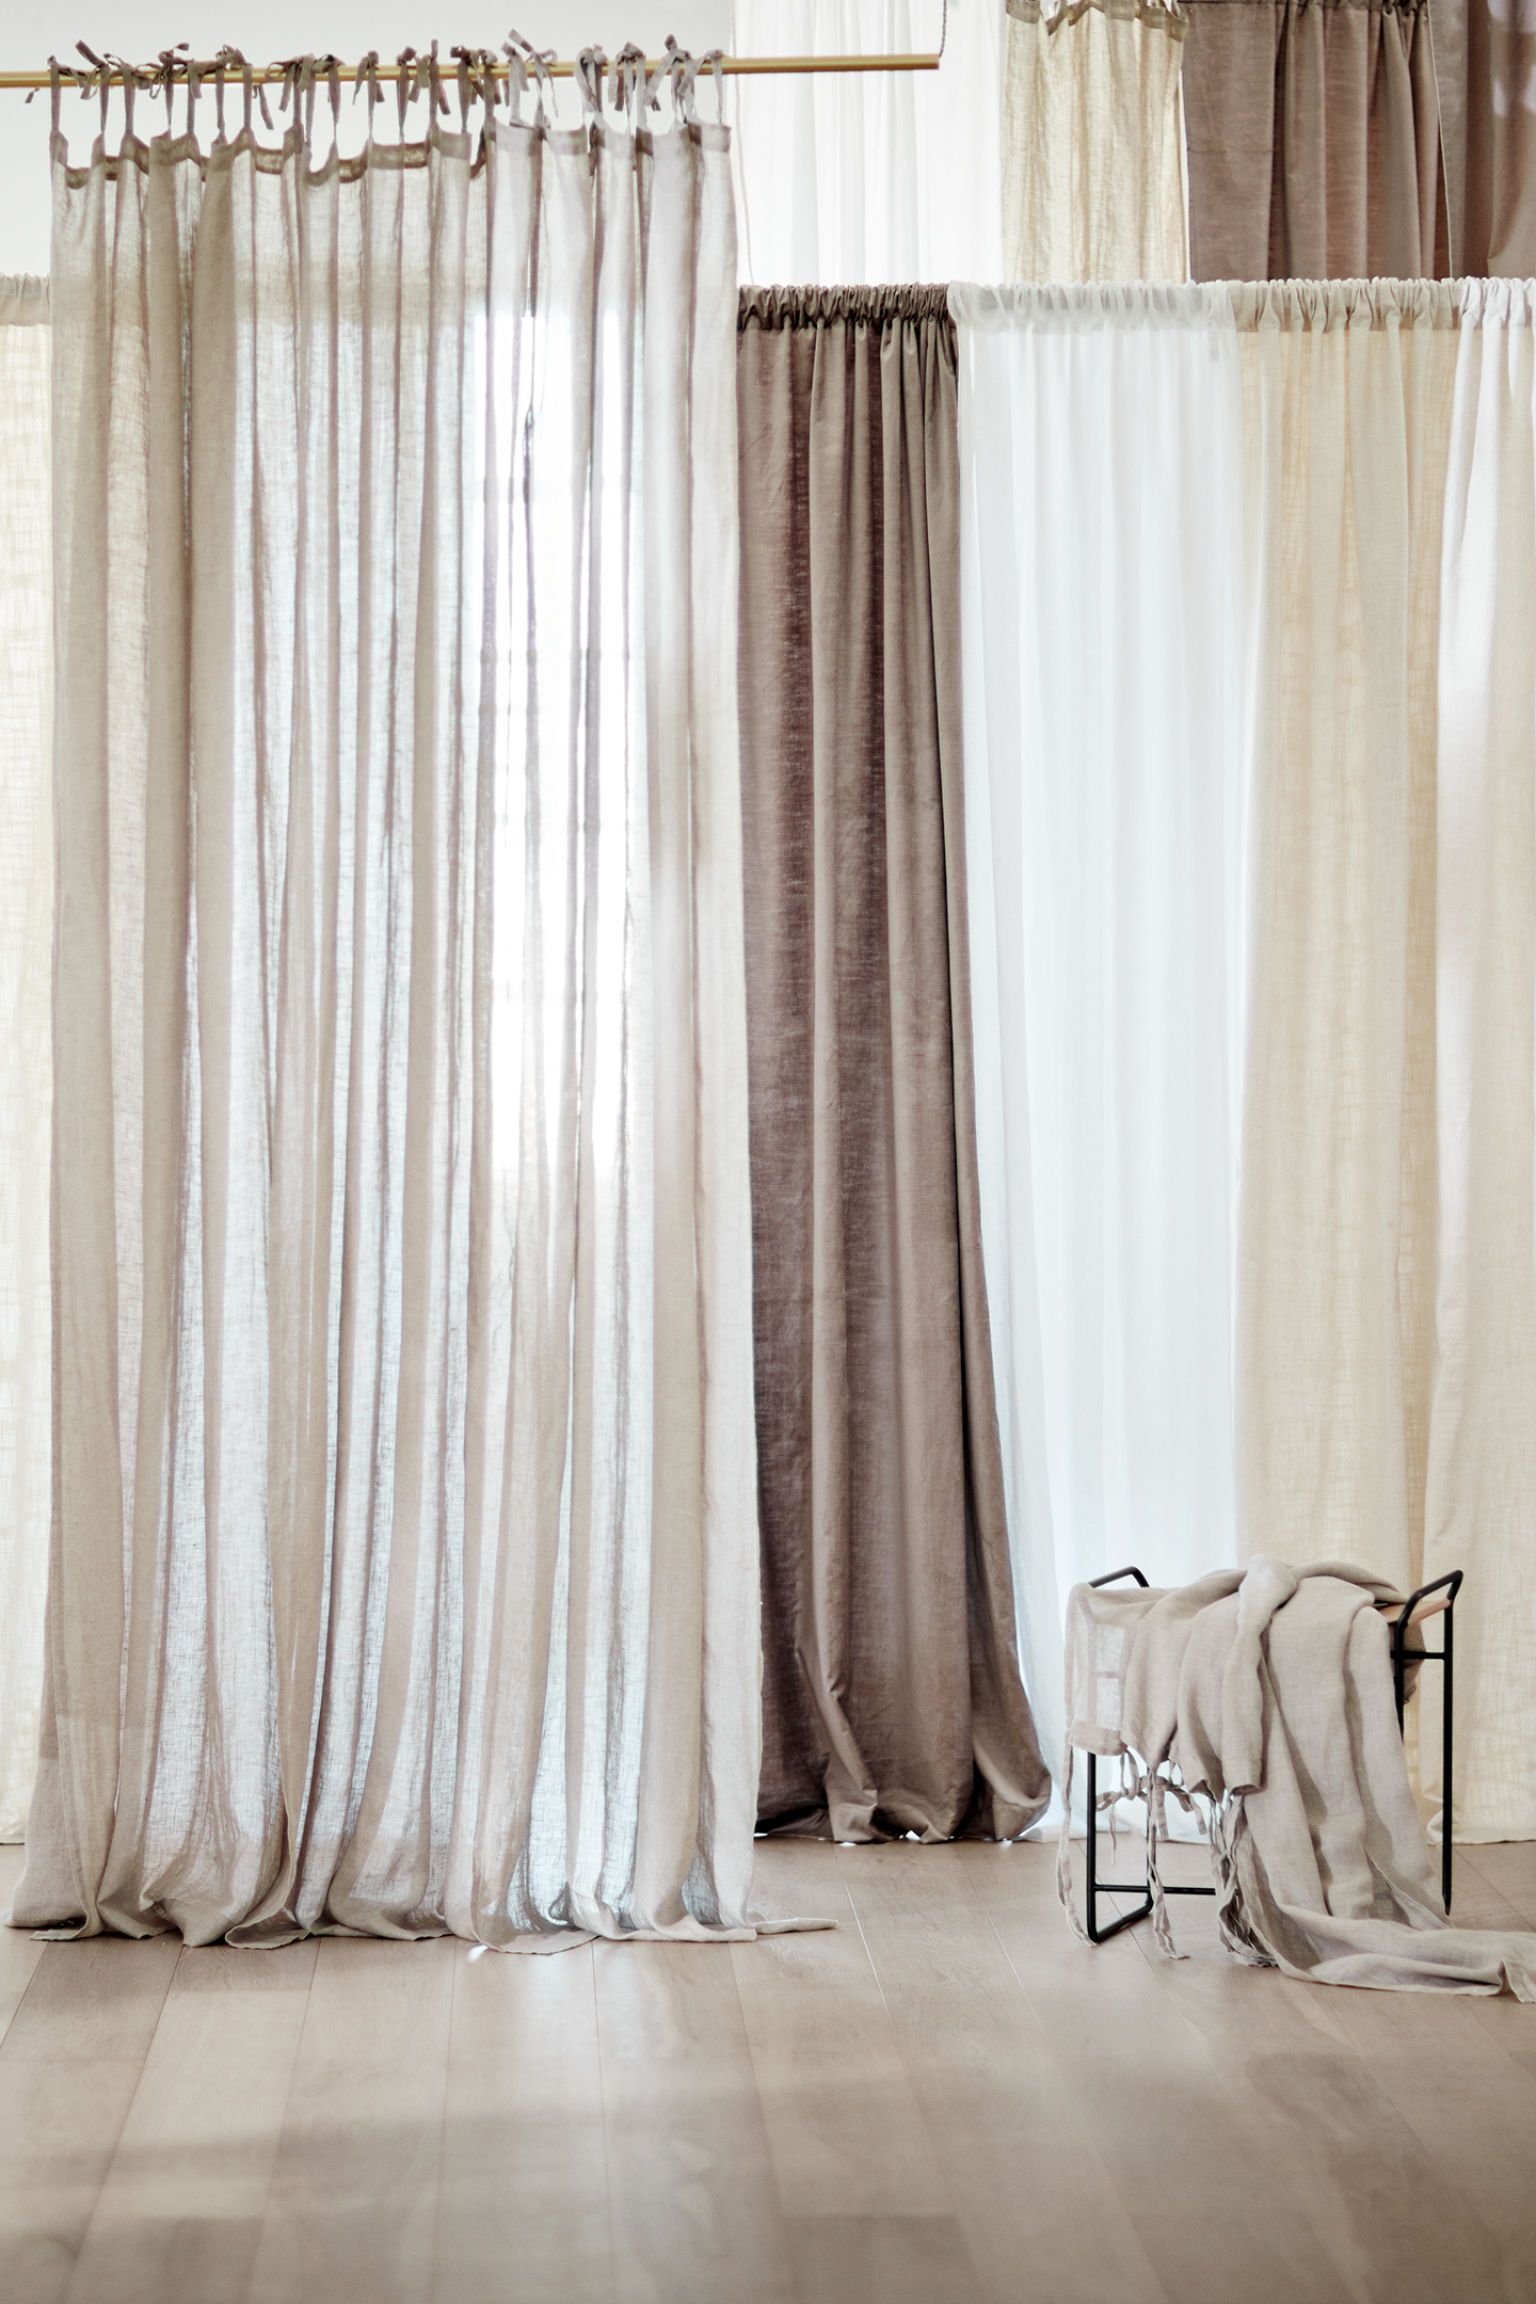 2 Pack Velvet Curtain Lengths Light Mole Home All H M Gb Linen Curtain Panels Panel Curtains Linen Curtains